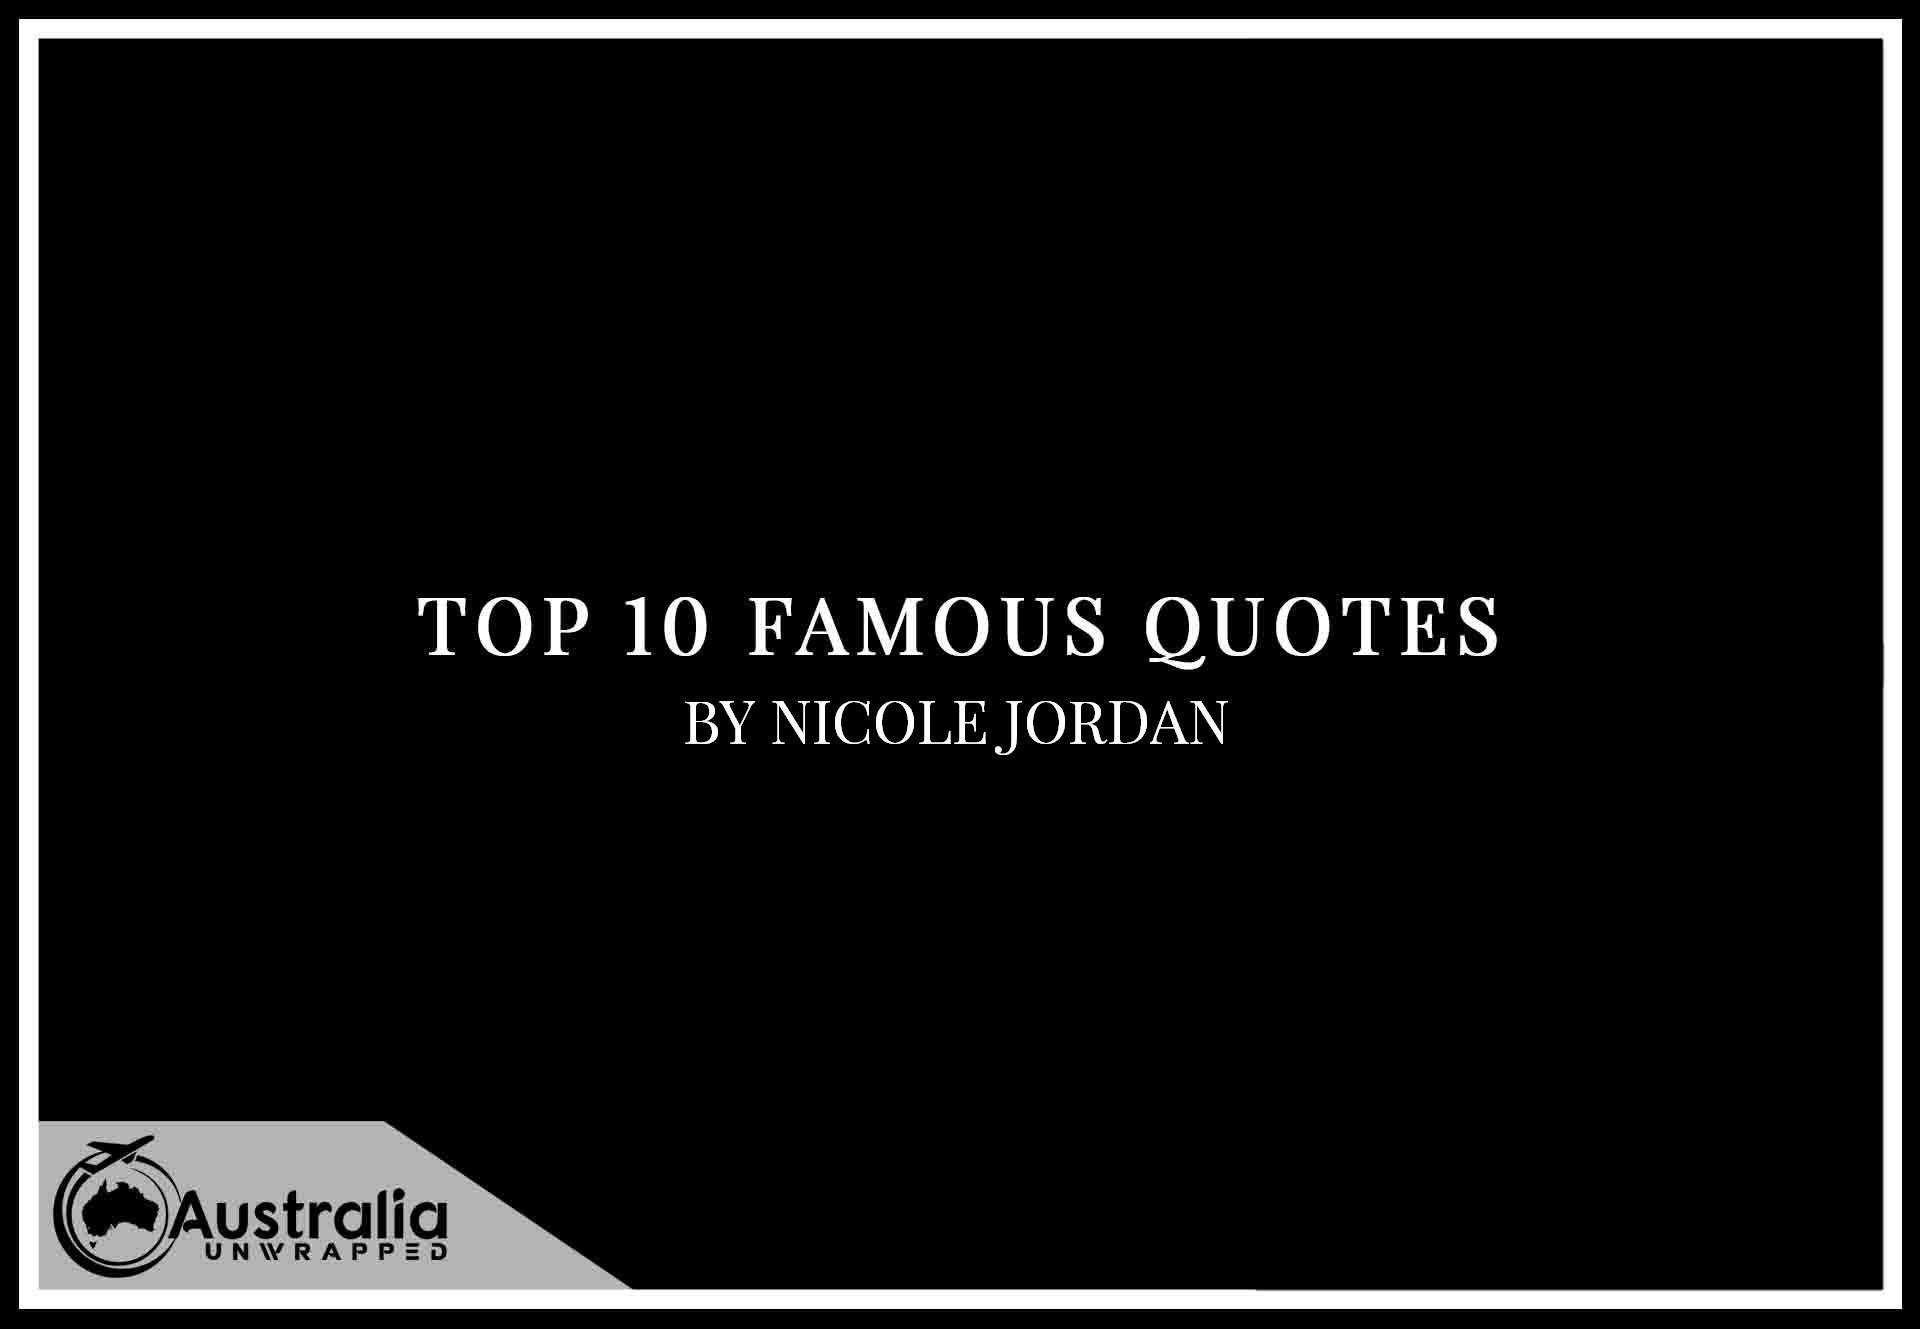 Top 10 Famous Quotes by Author Nicole Jordan